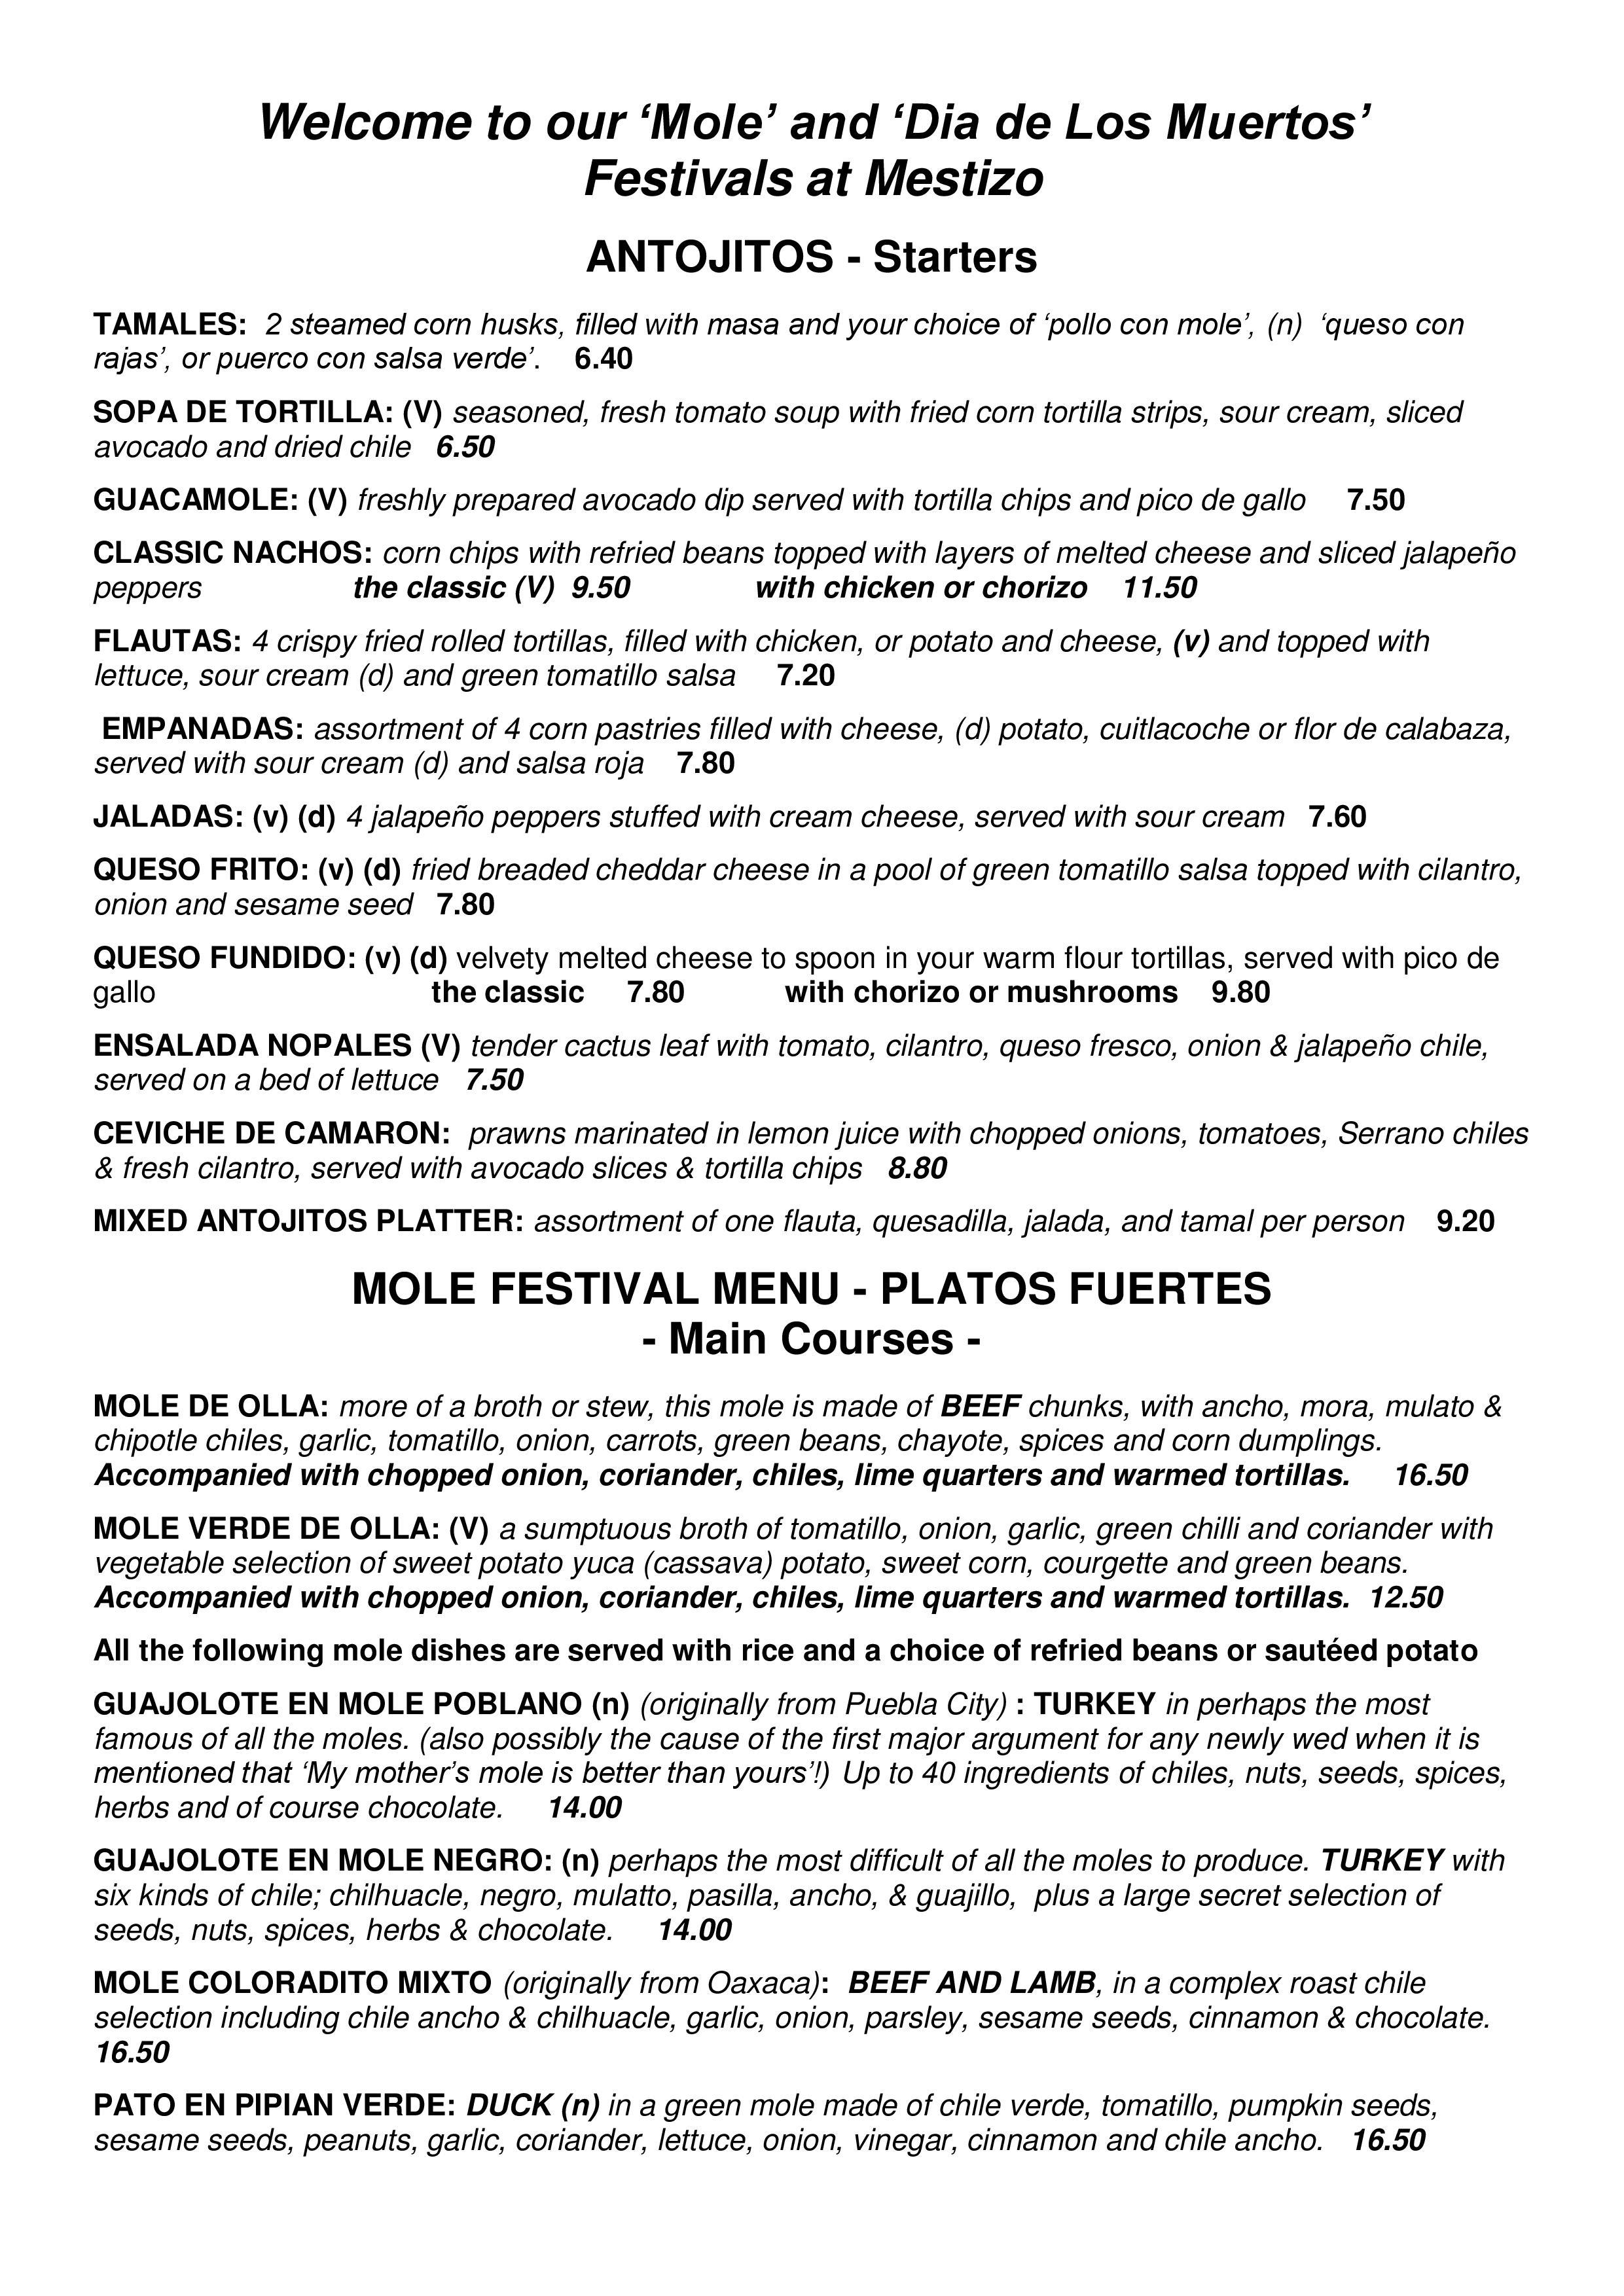 a4 Final Mole Menu 2017-page-001